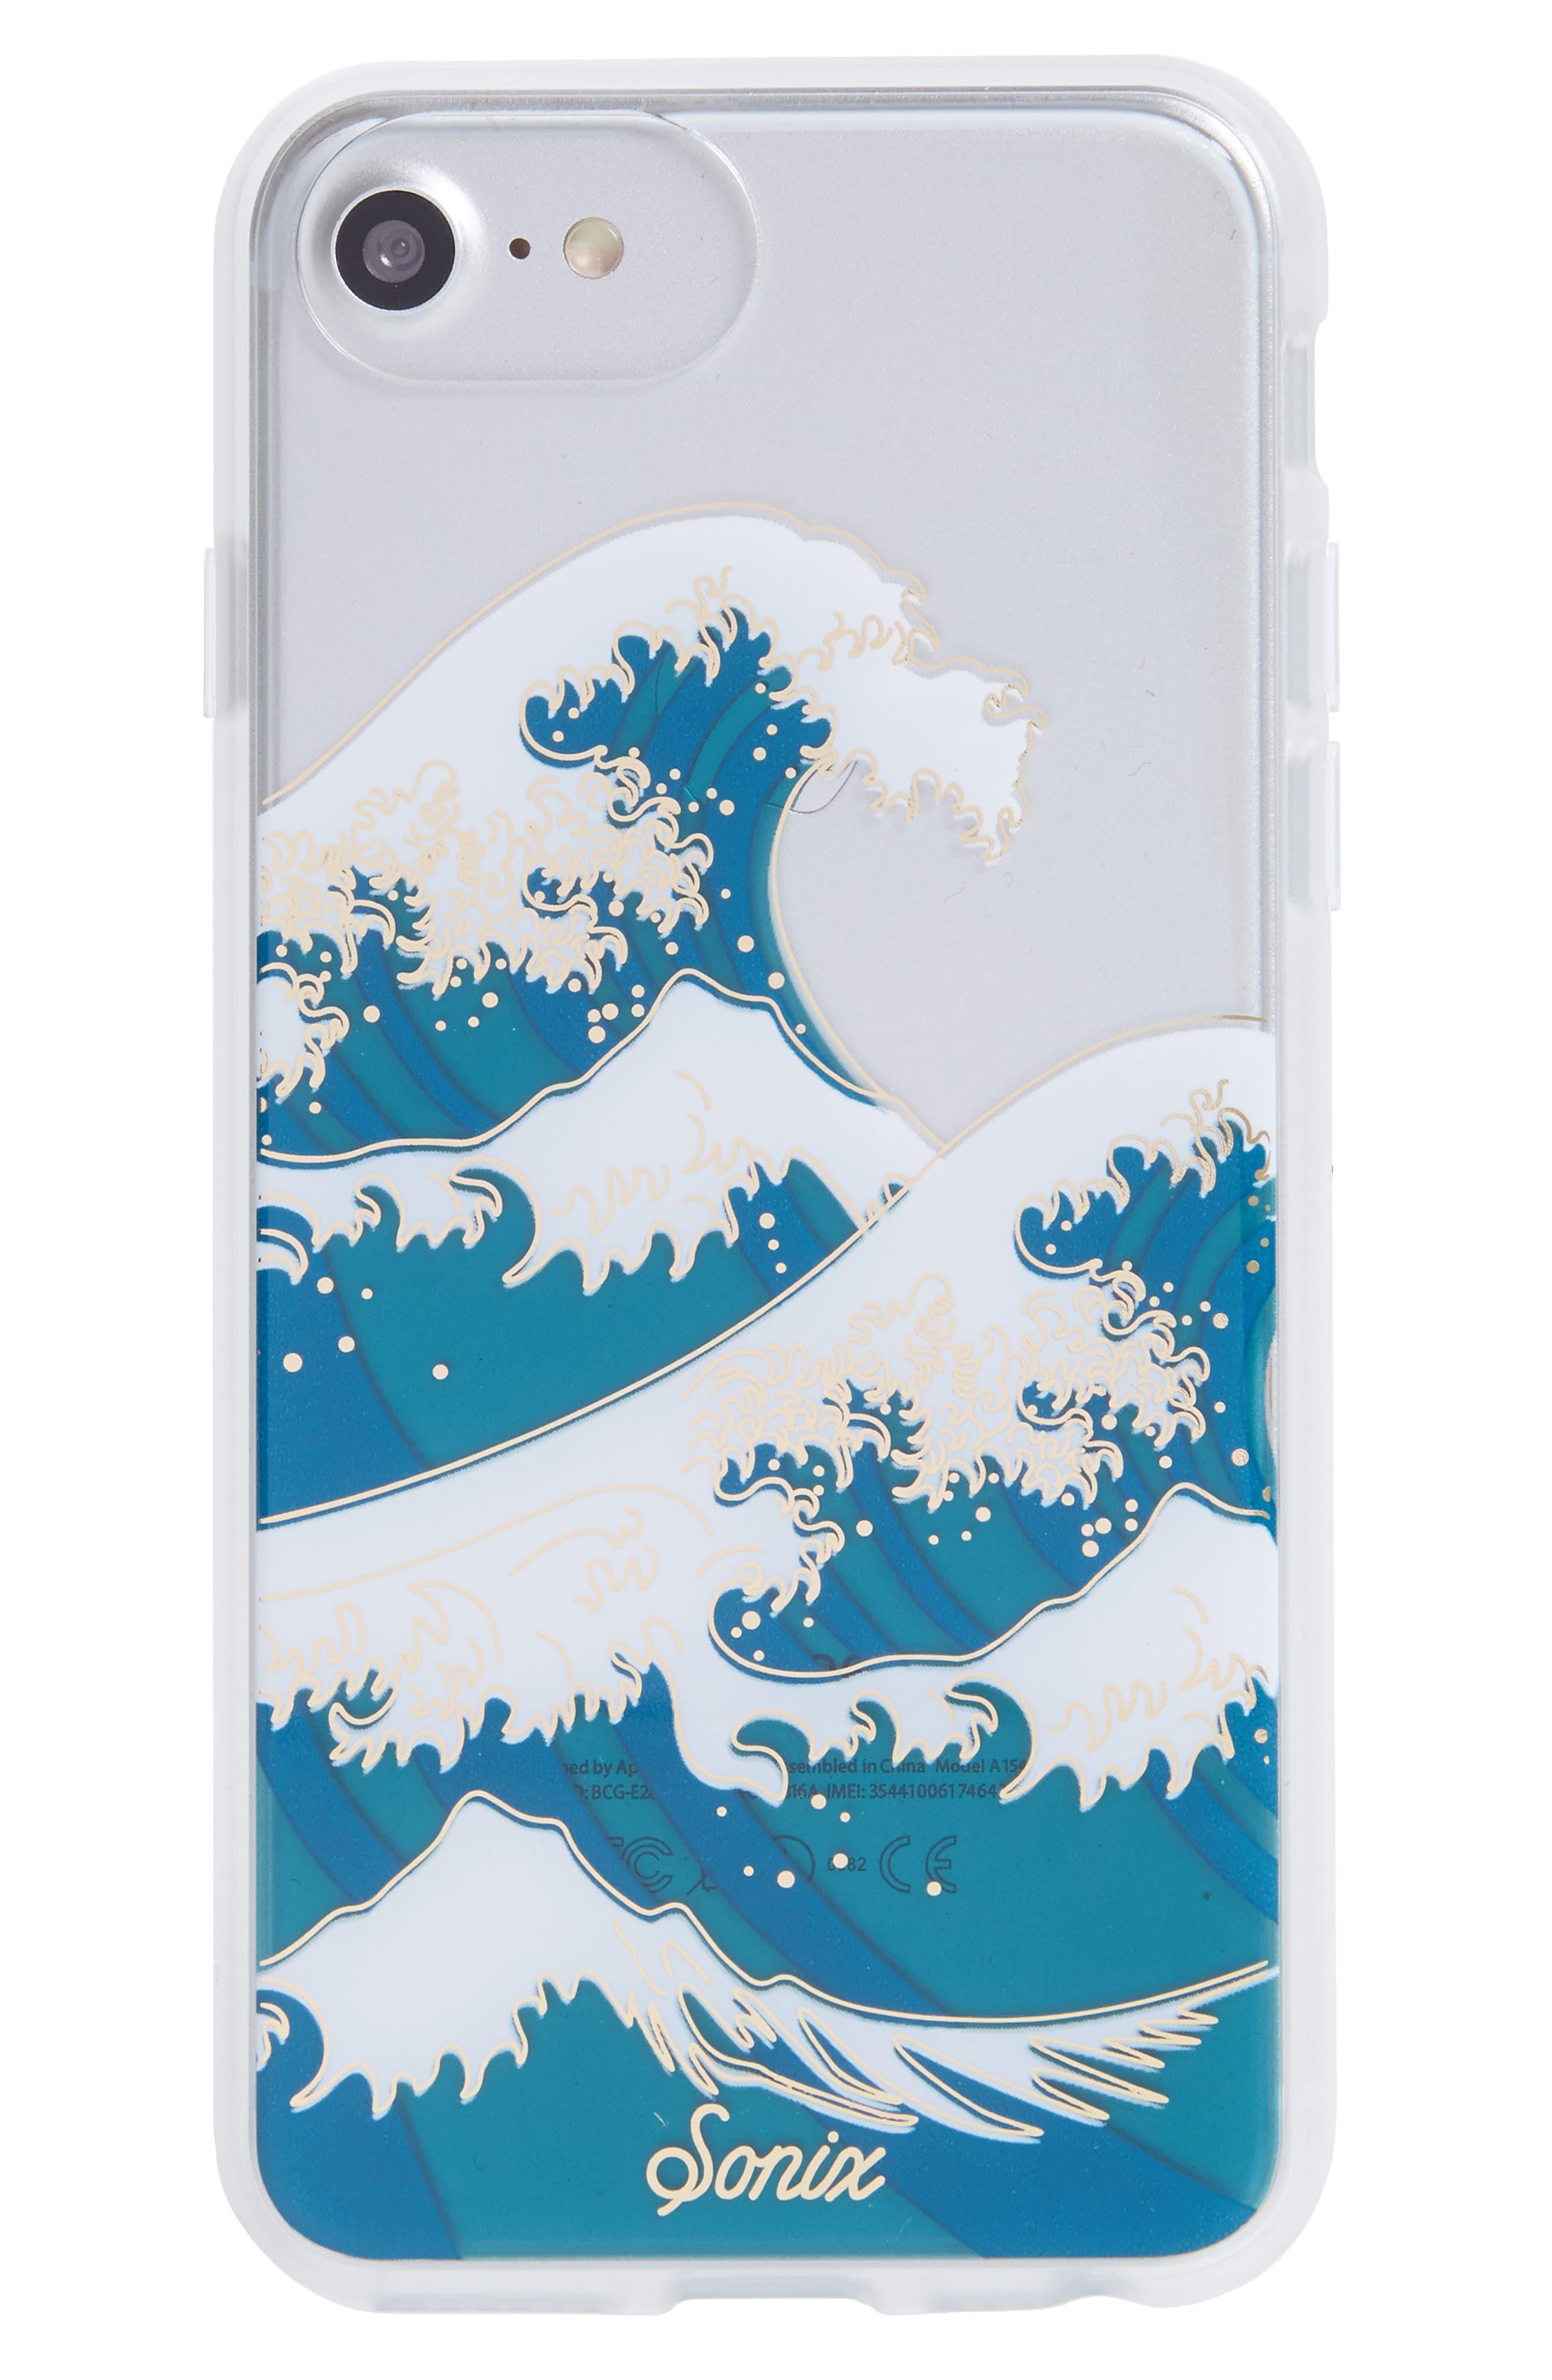 Sonix Tokyo Wave iPhone 6/7 & 6/7 Plus Case